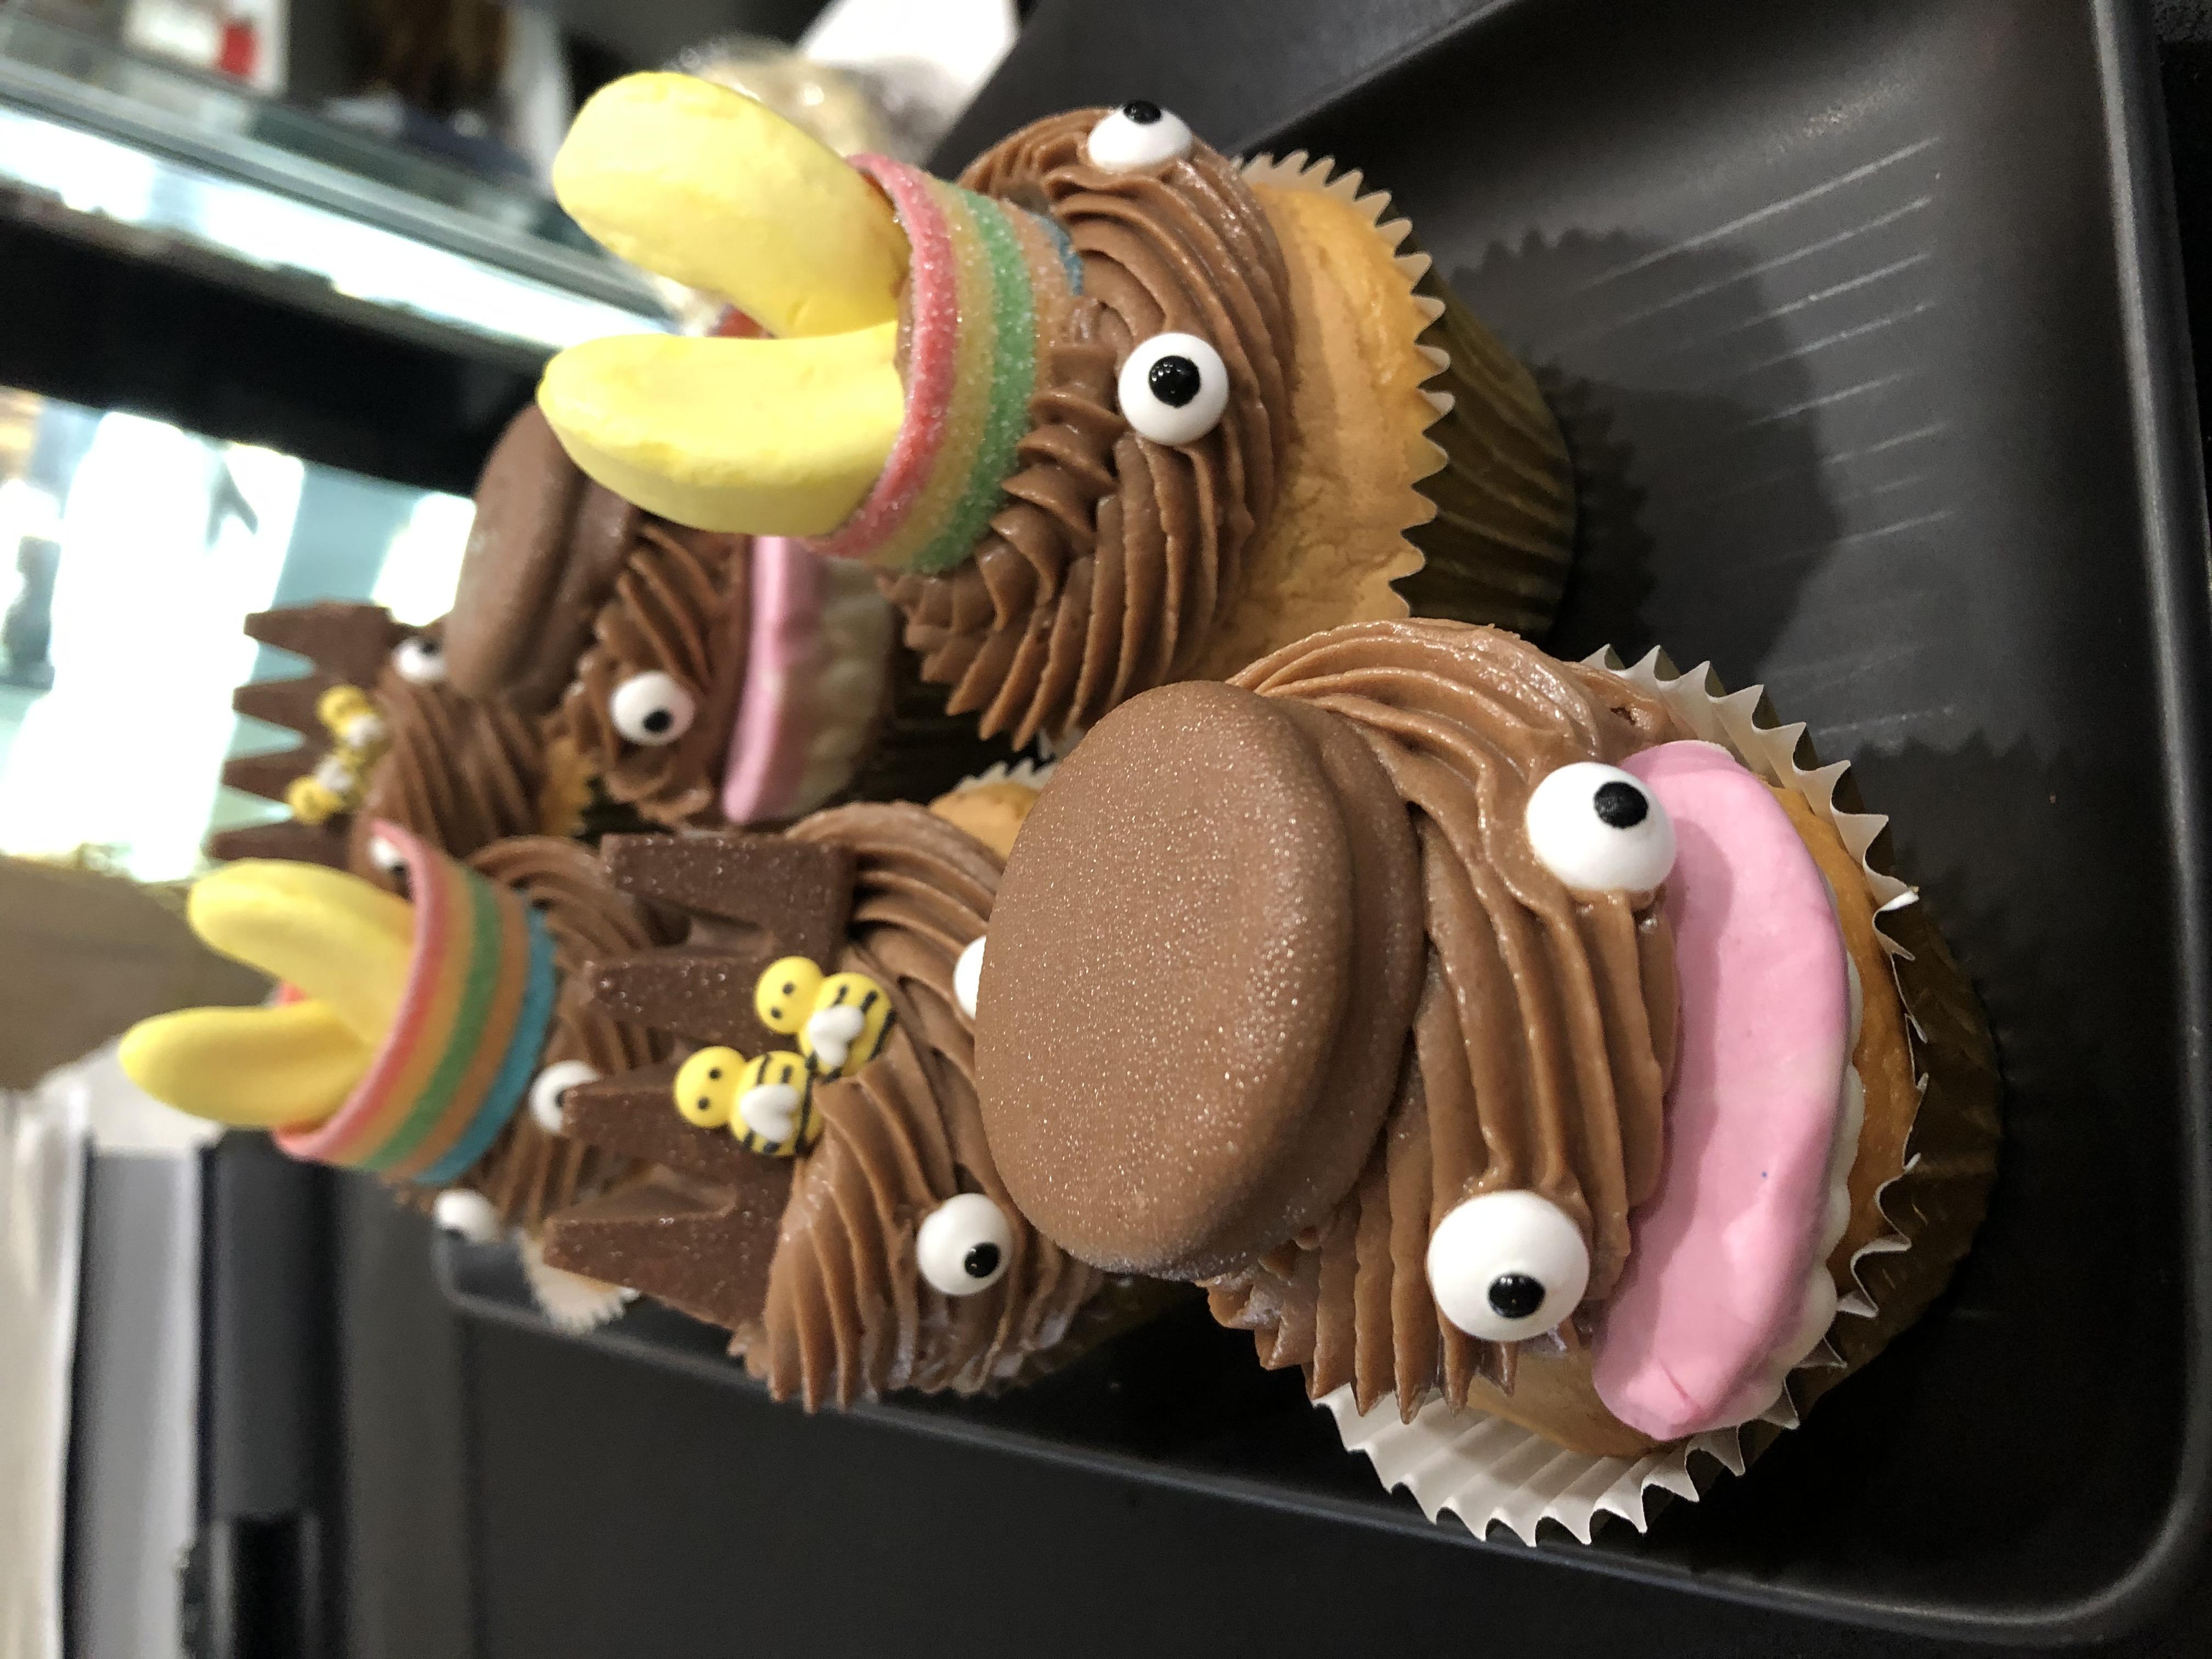 Crazy cupcakes - yum